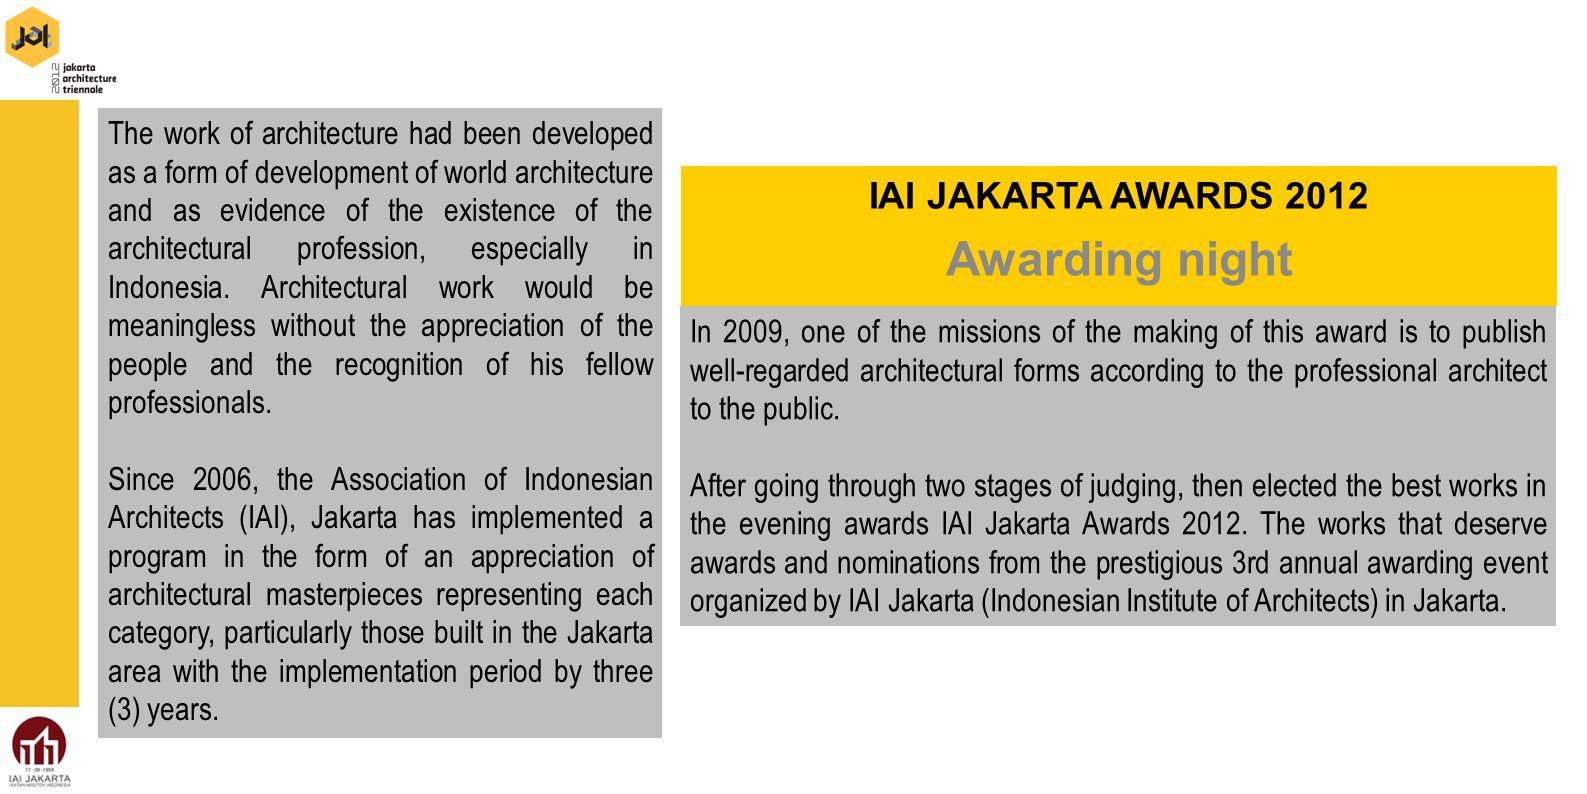 Awarding night IAI JAKARTA AWARDS 2012